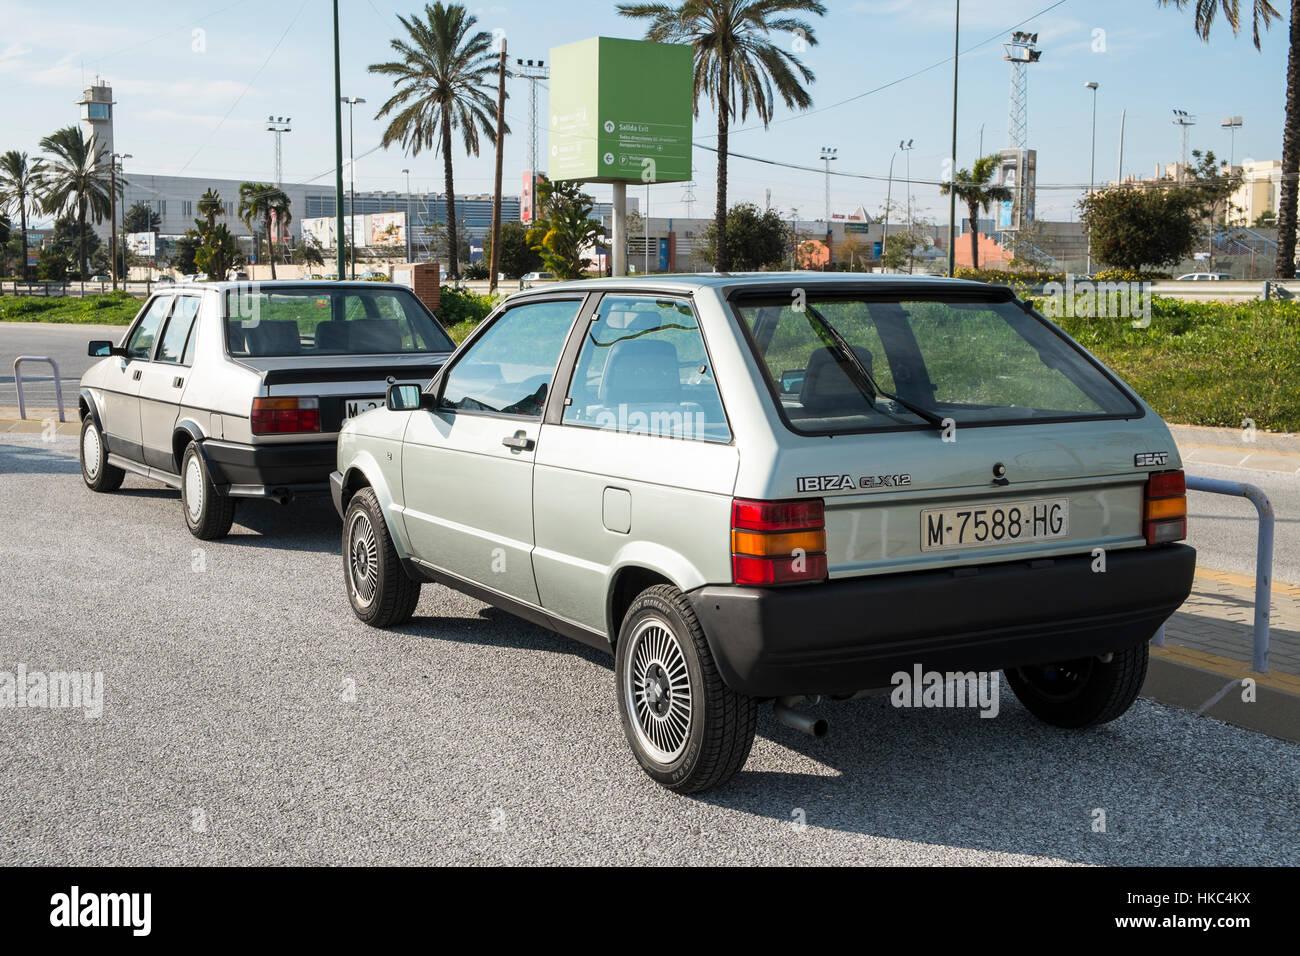 1986 Seat Ibiza 1.2 GLX - Stock Image